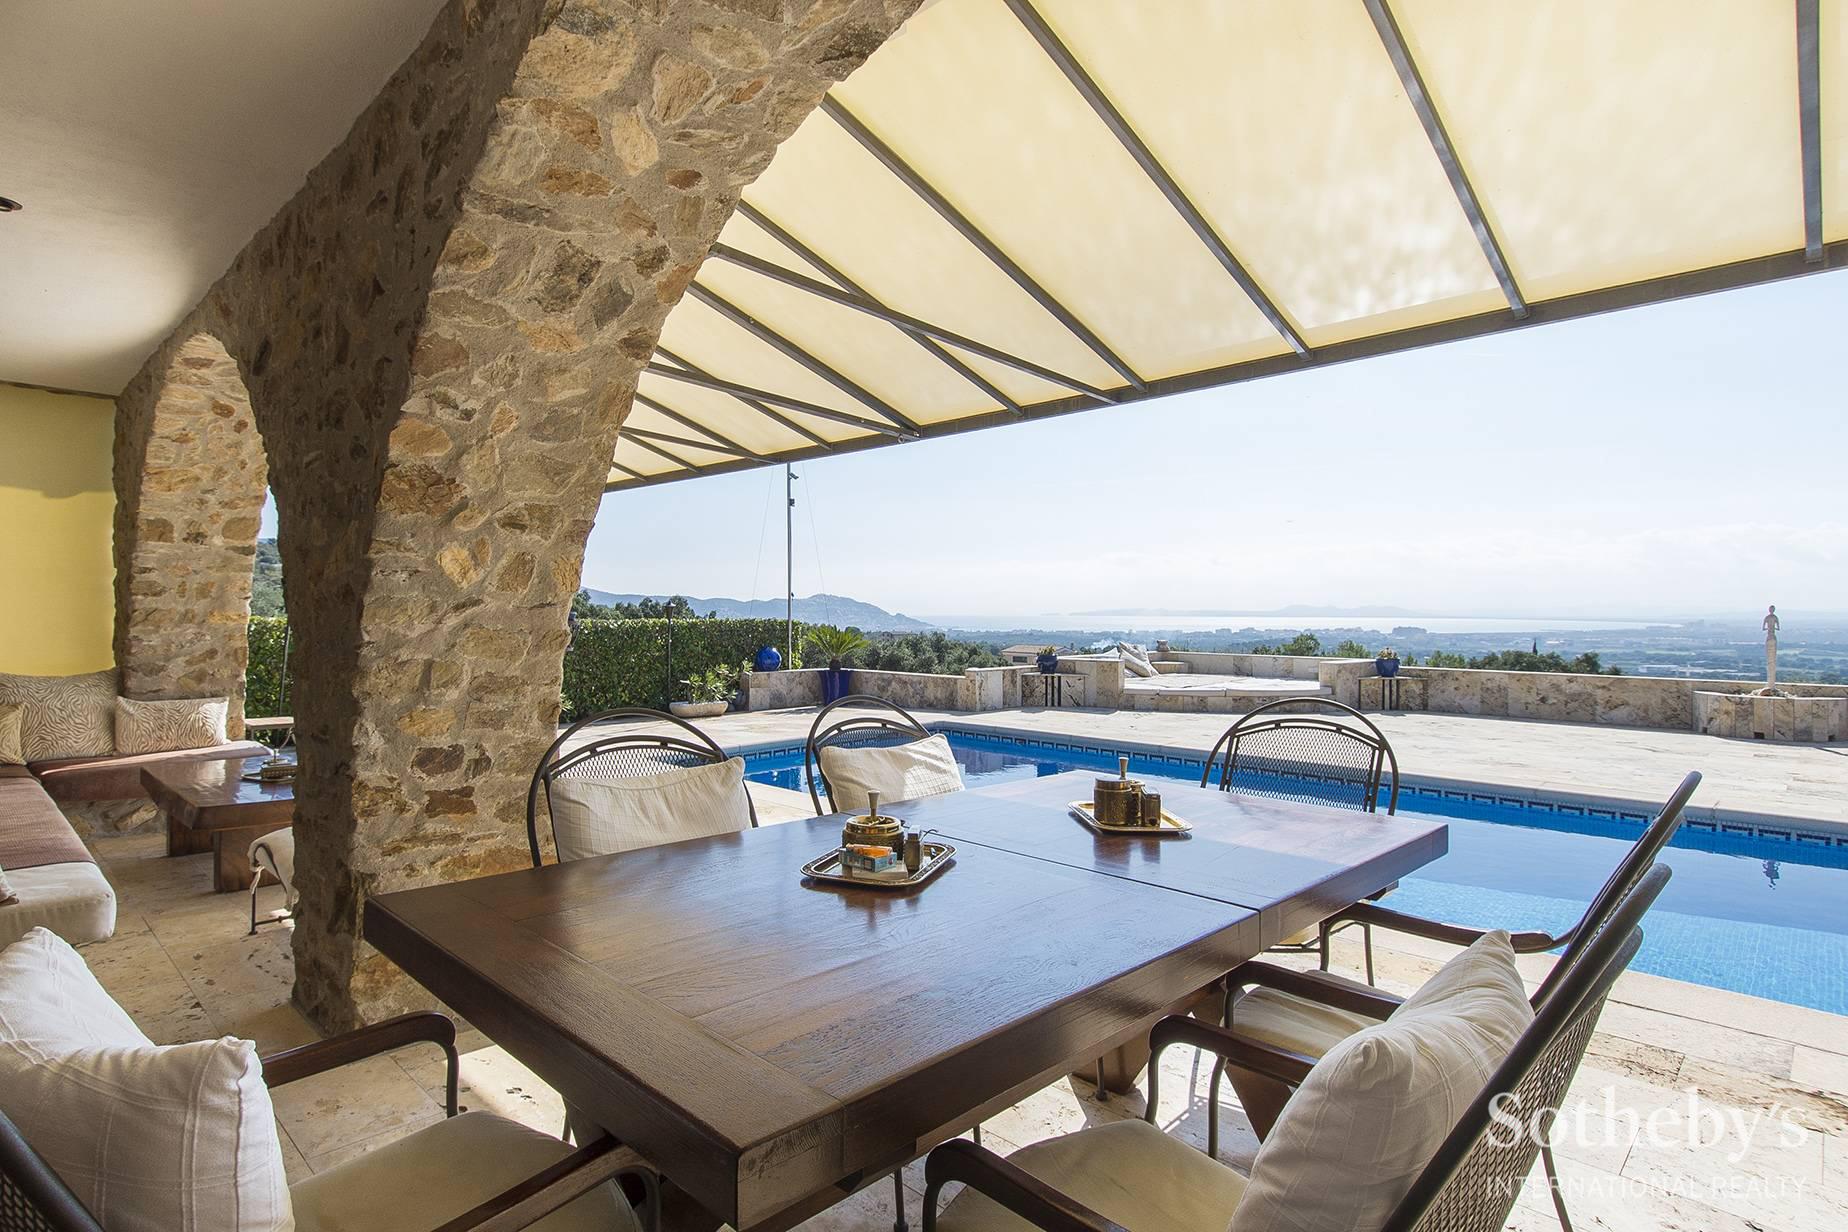 Rustic house for sale with sea views Palau Saverdera, Costa Brava